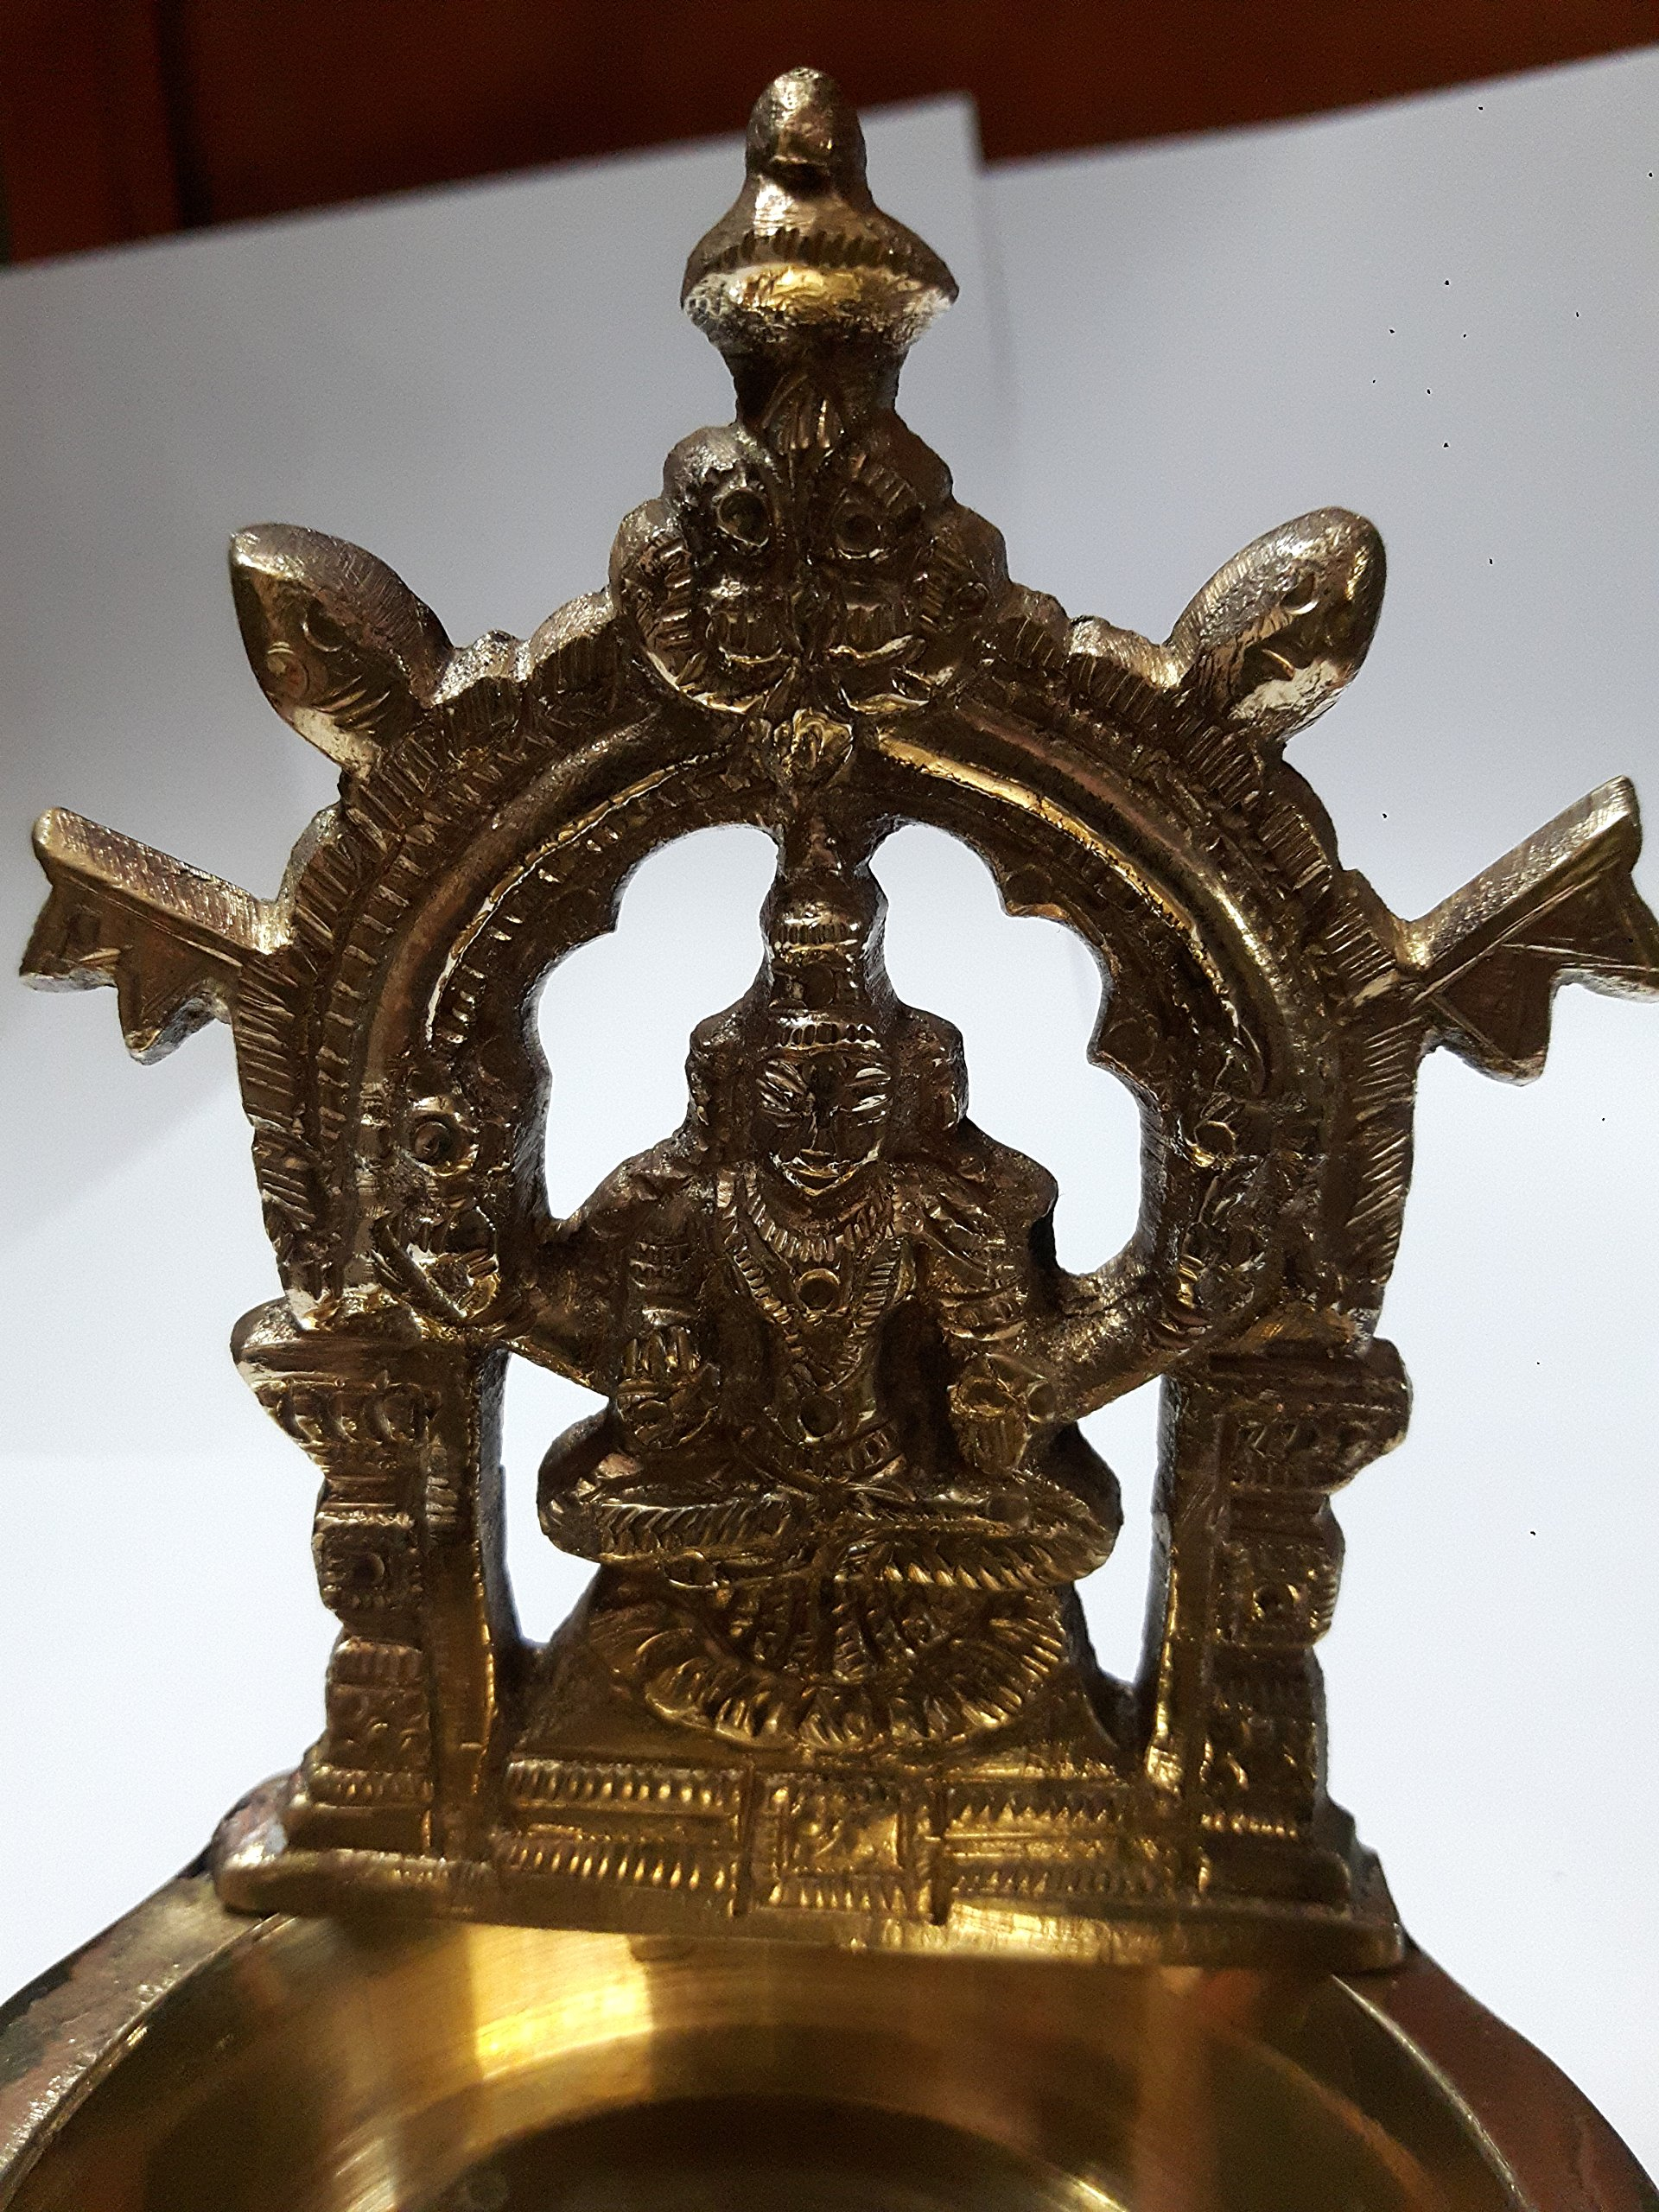 Mookambigai Lamp India Brass Diya Deepak Akhand Jyot Kuber Hindu Temple Havan Puja Religious Oil Lamp (11 cms Height) by RiteClick (Image #3)